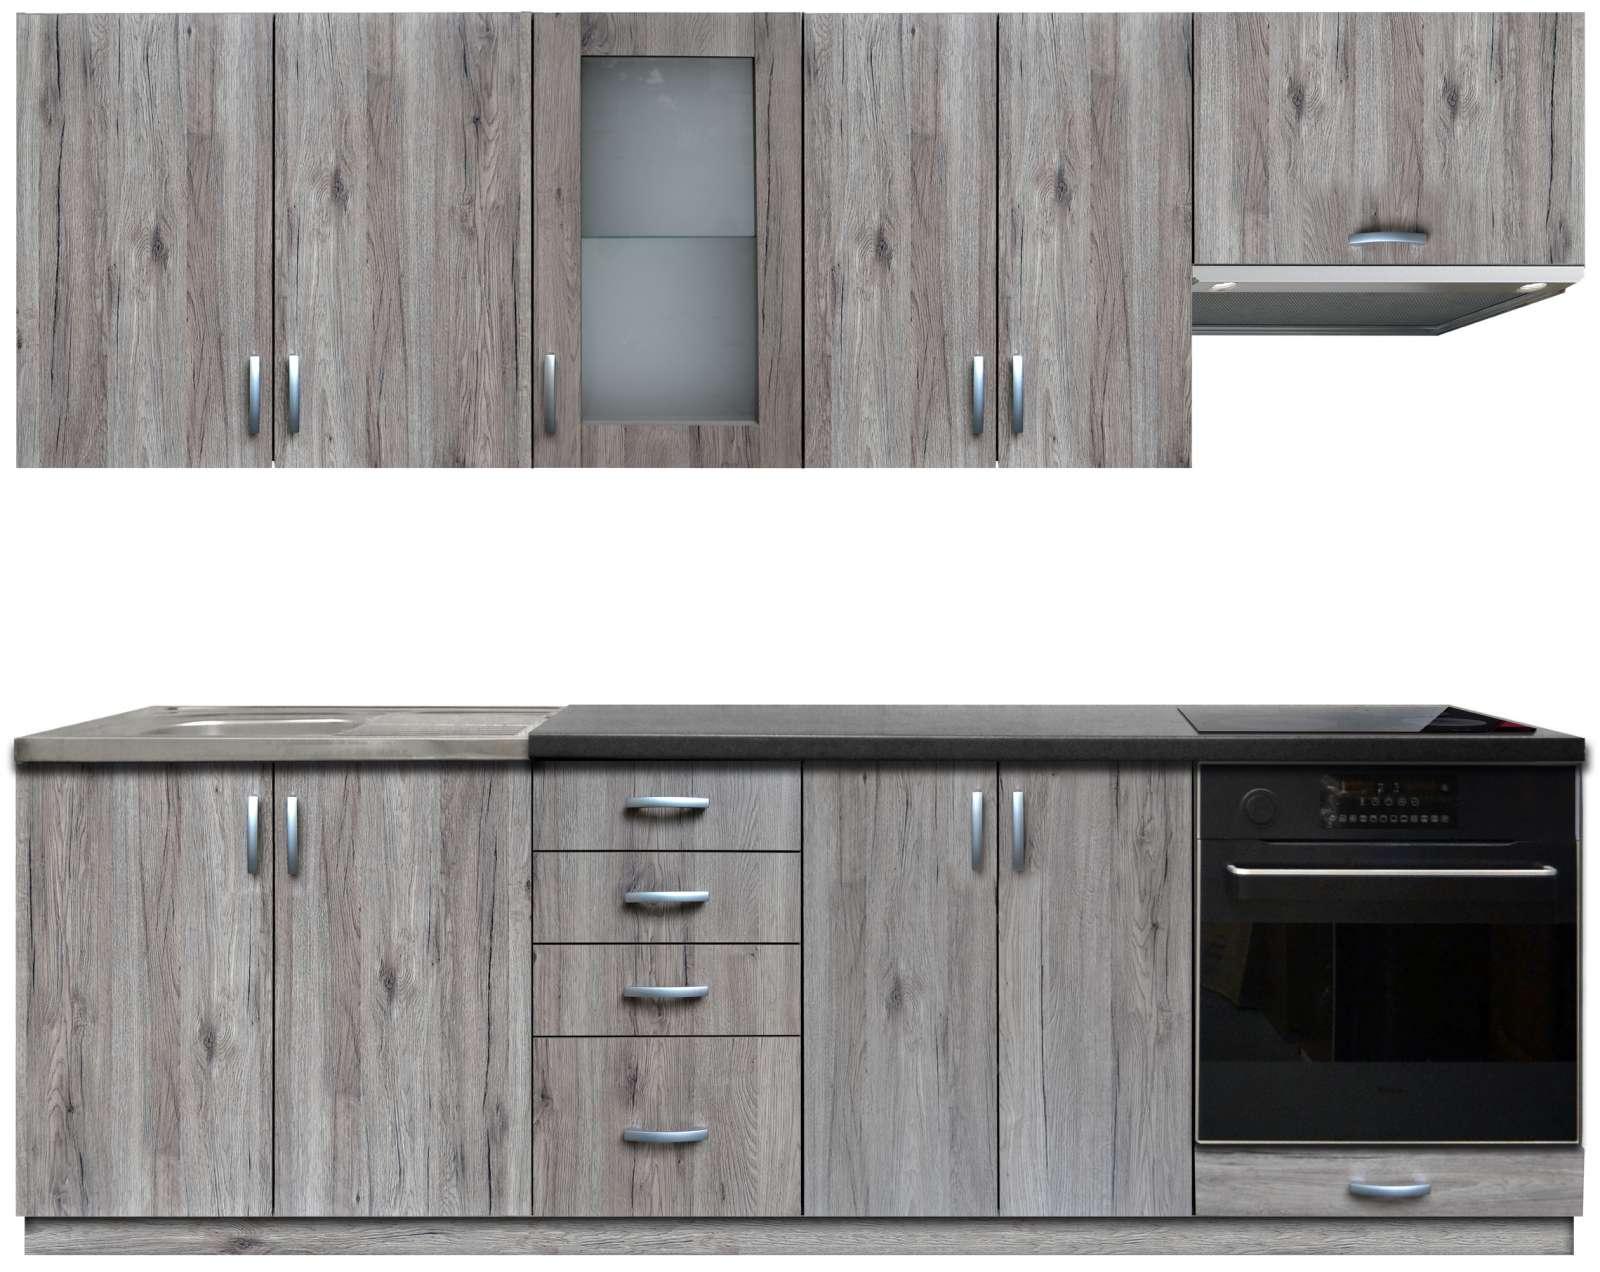 Kuchyňská linka s dřezem Baworka 240 cm sanremo